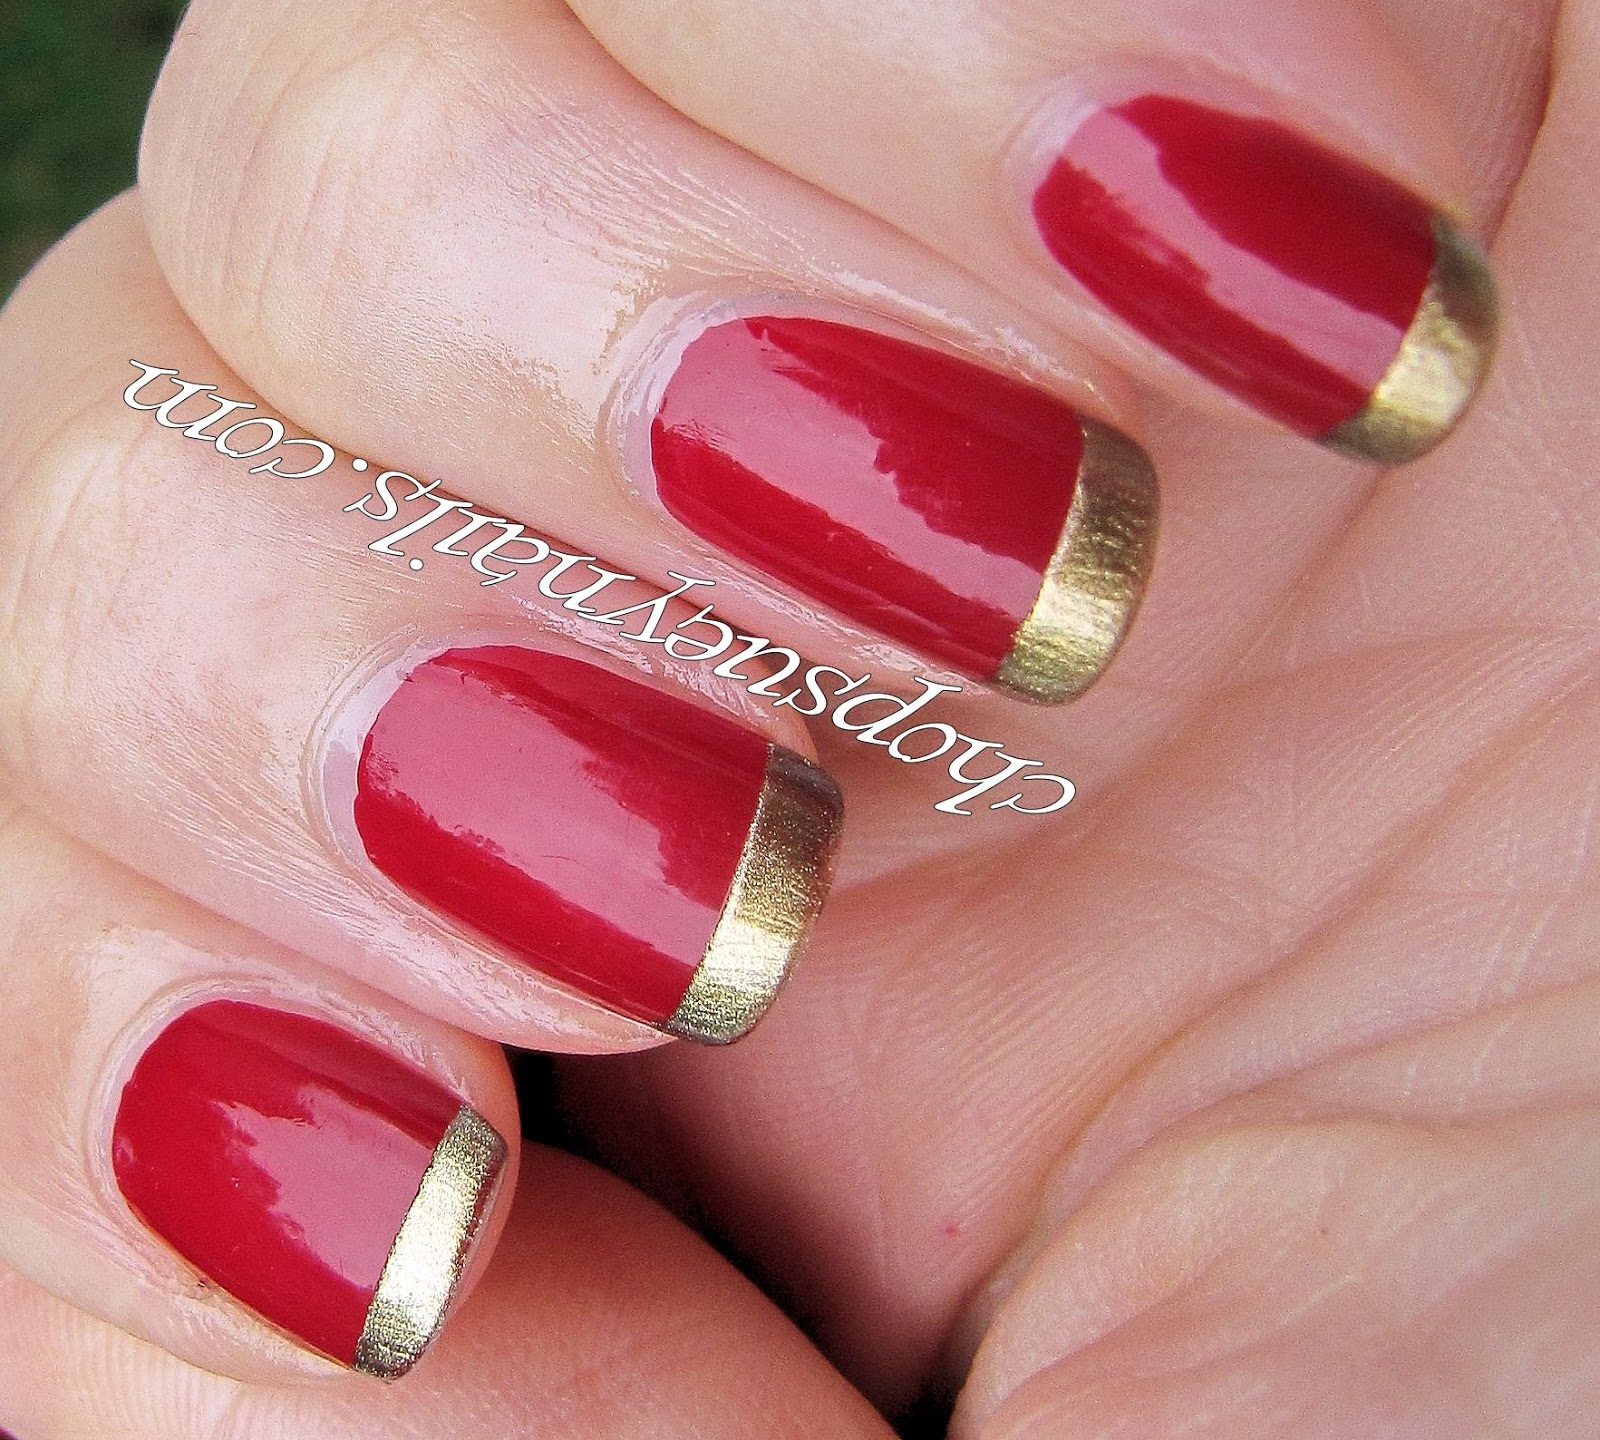 40 Flamboyant Red and Gold Nails | Nail Design Ideaz